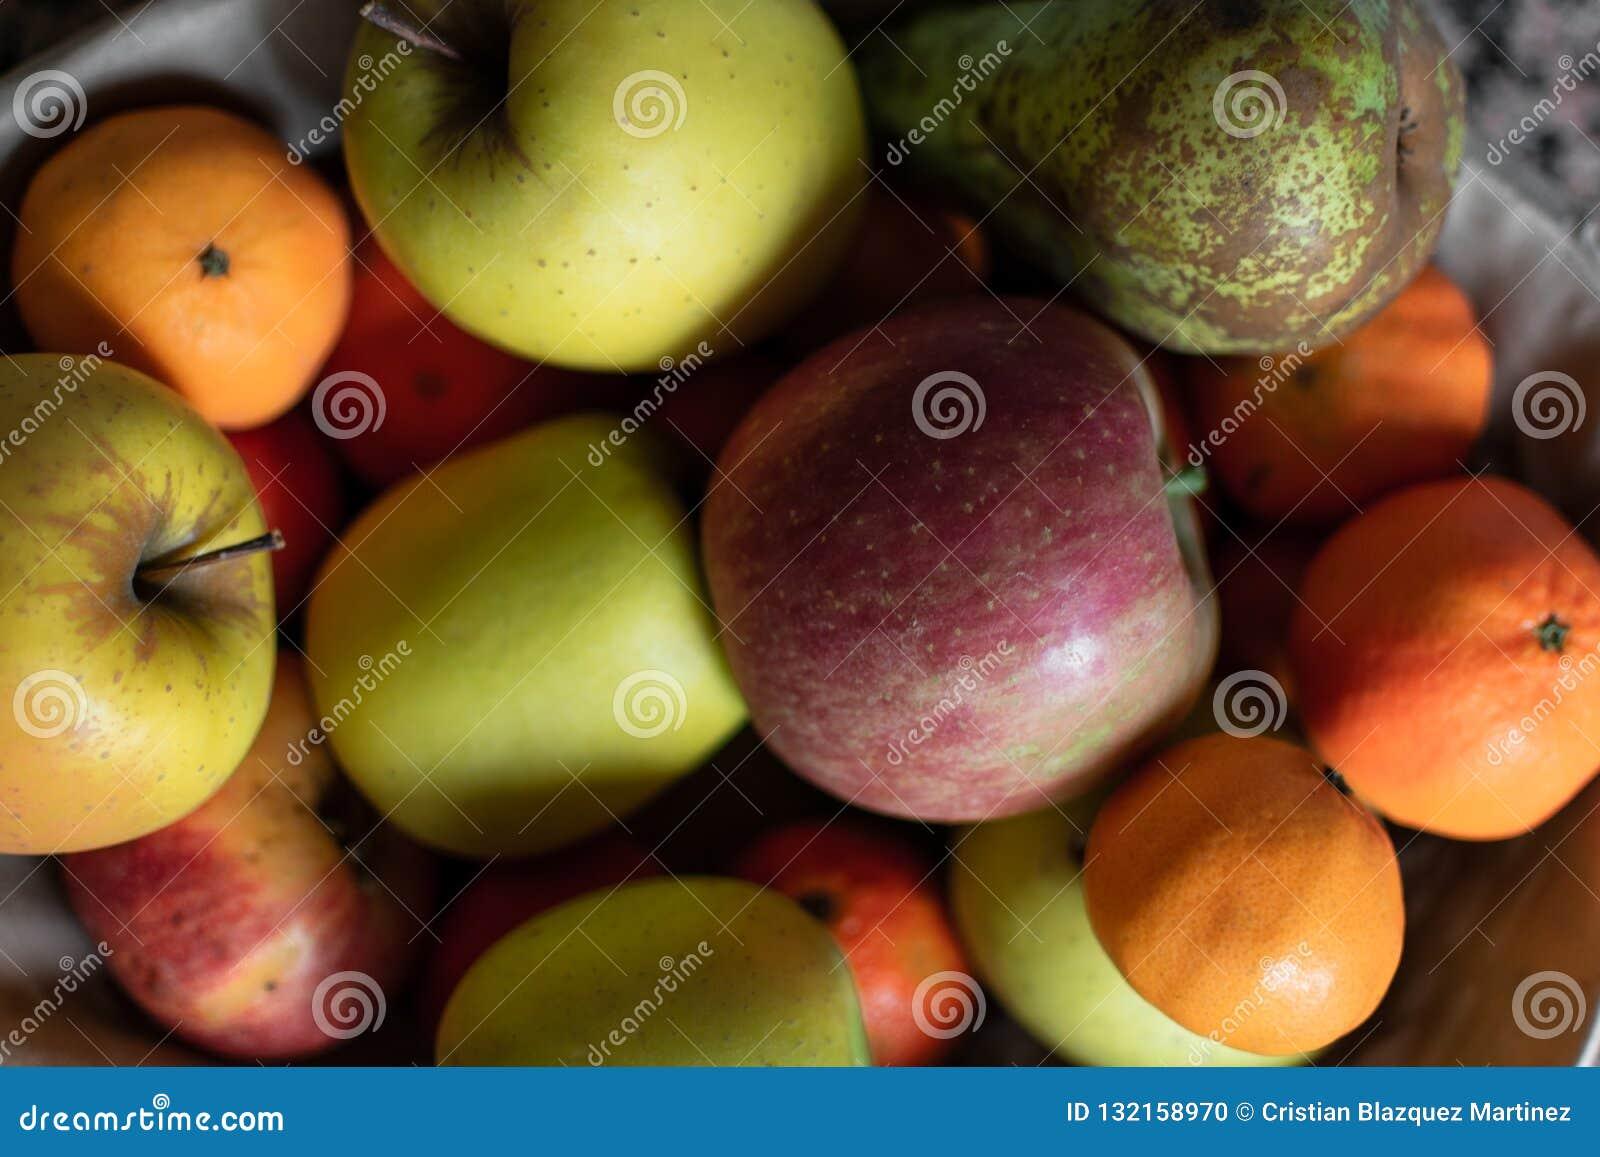 Fruit basket in a kitchen